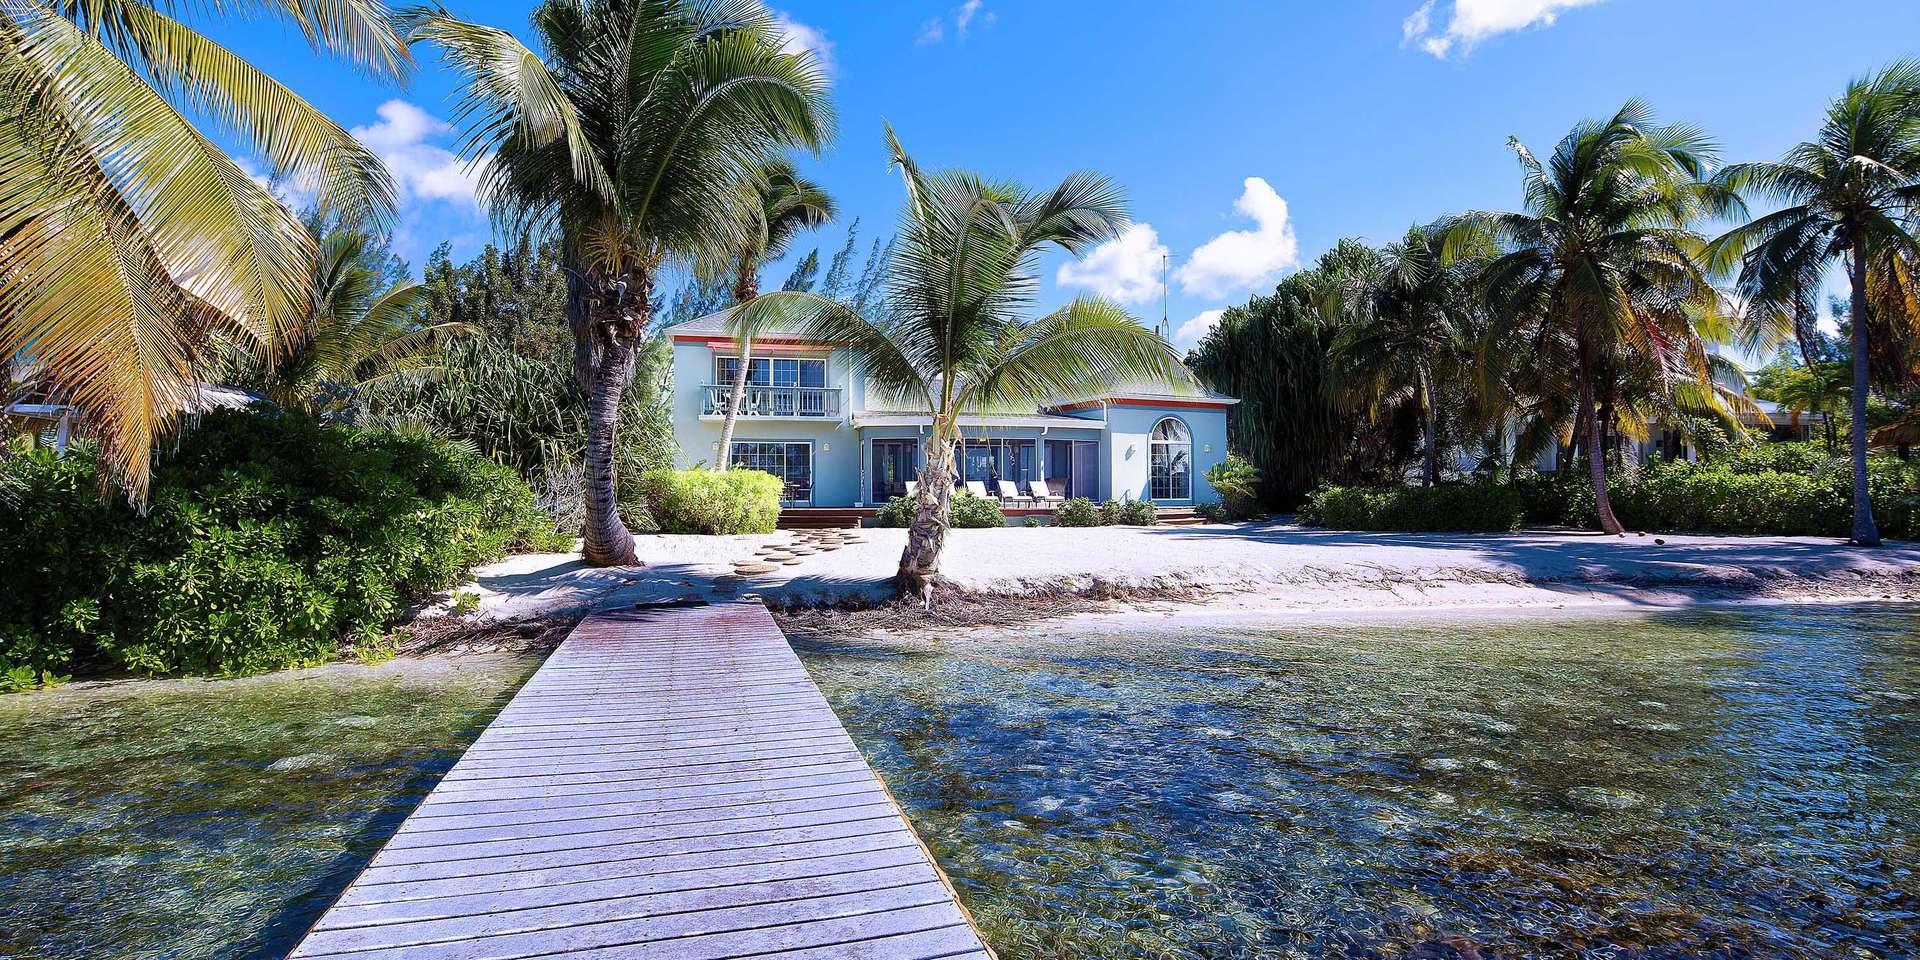 Luxury villa rentals caribbean - Cayman islands - Grand cayman - Cayman kai - Sea Cove - Image 1/13